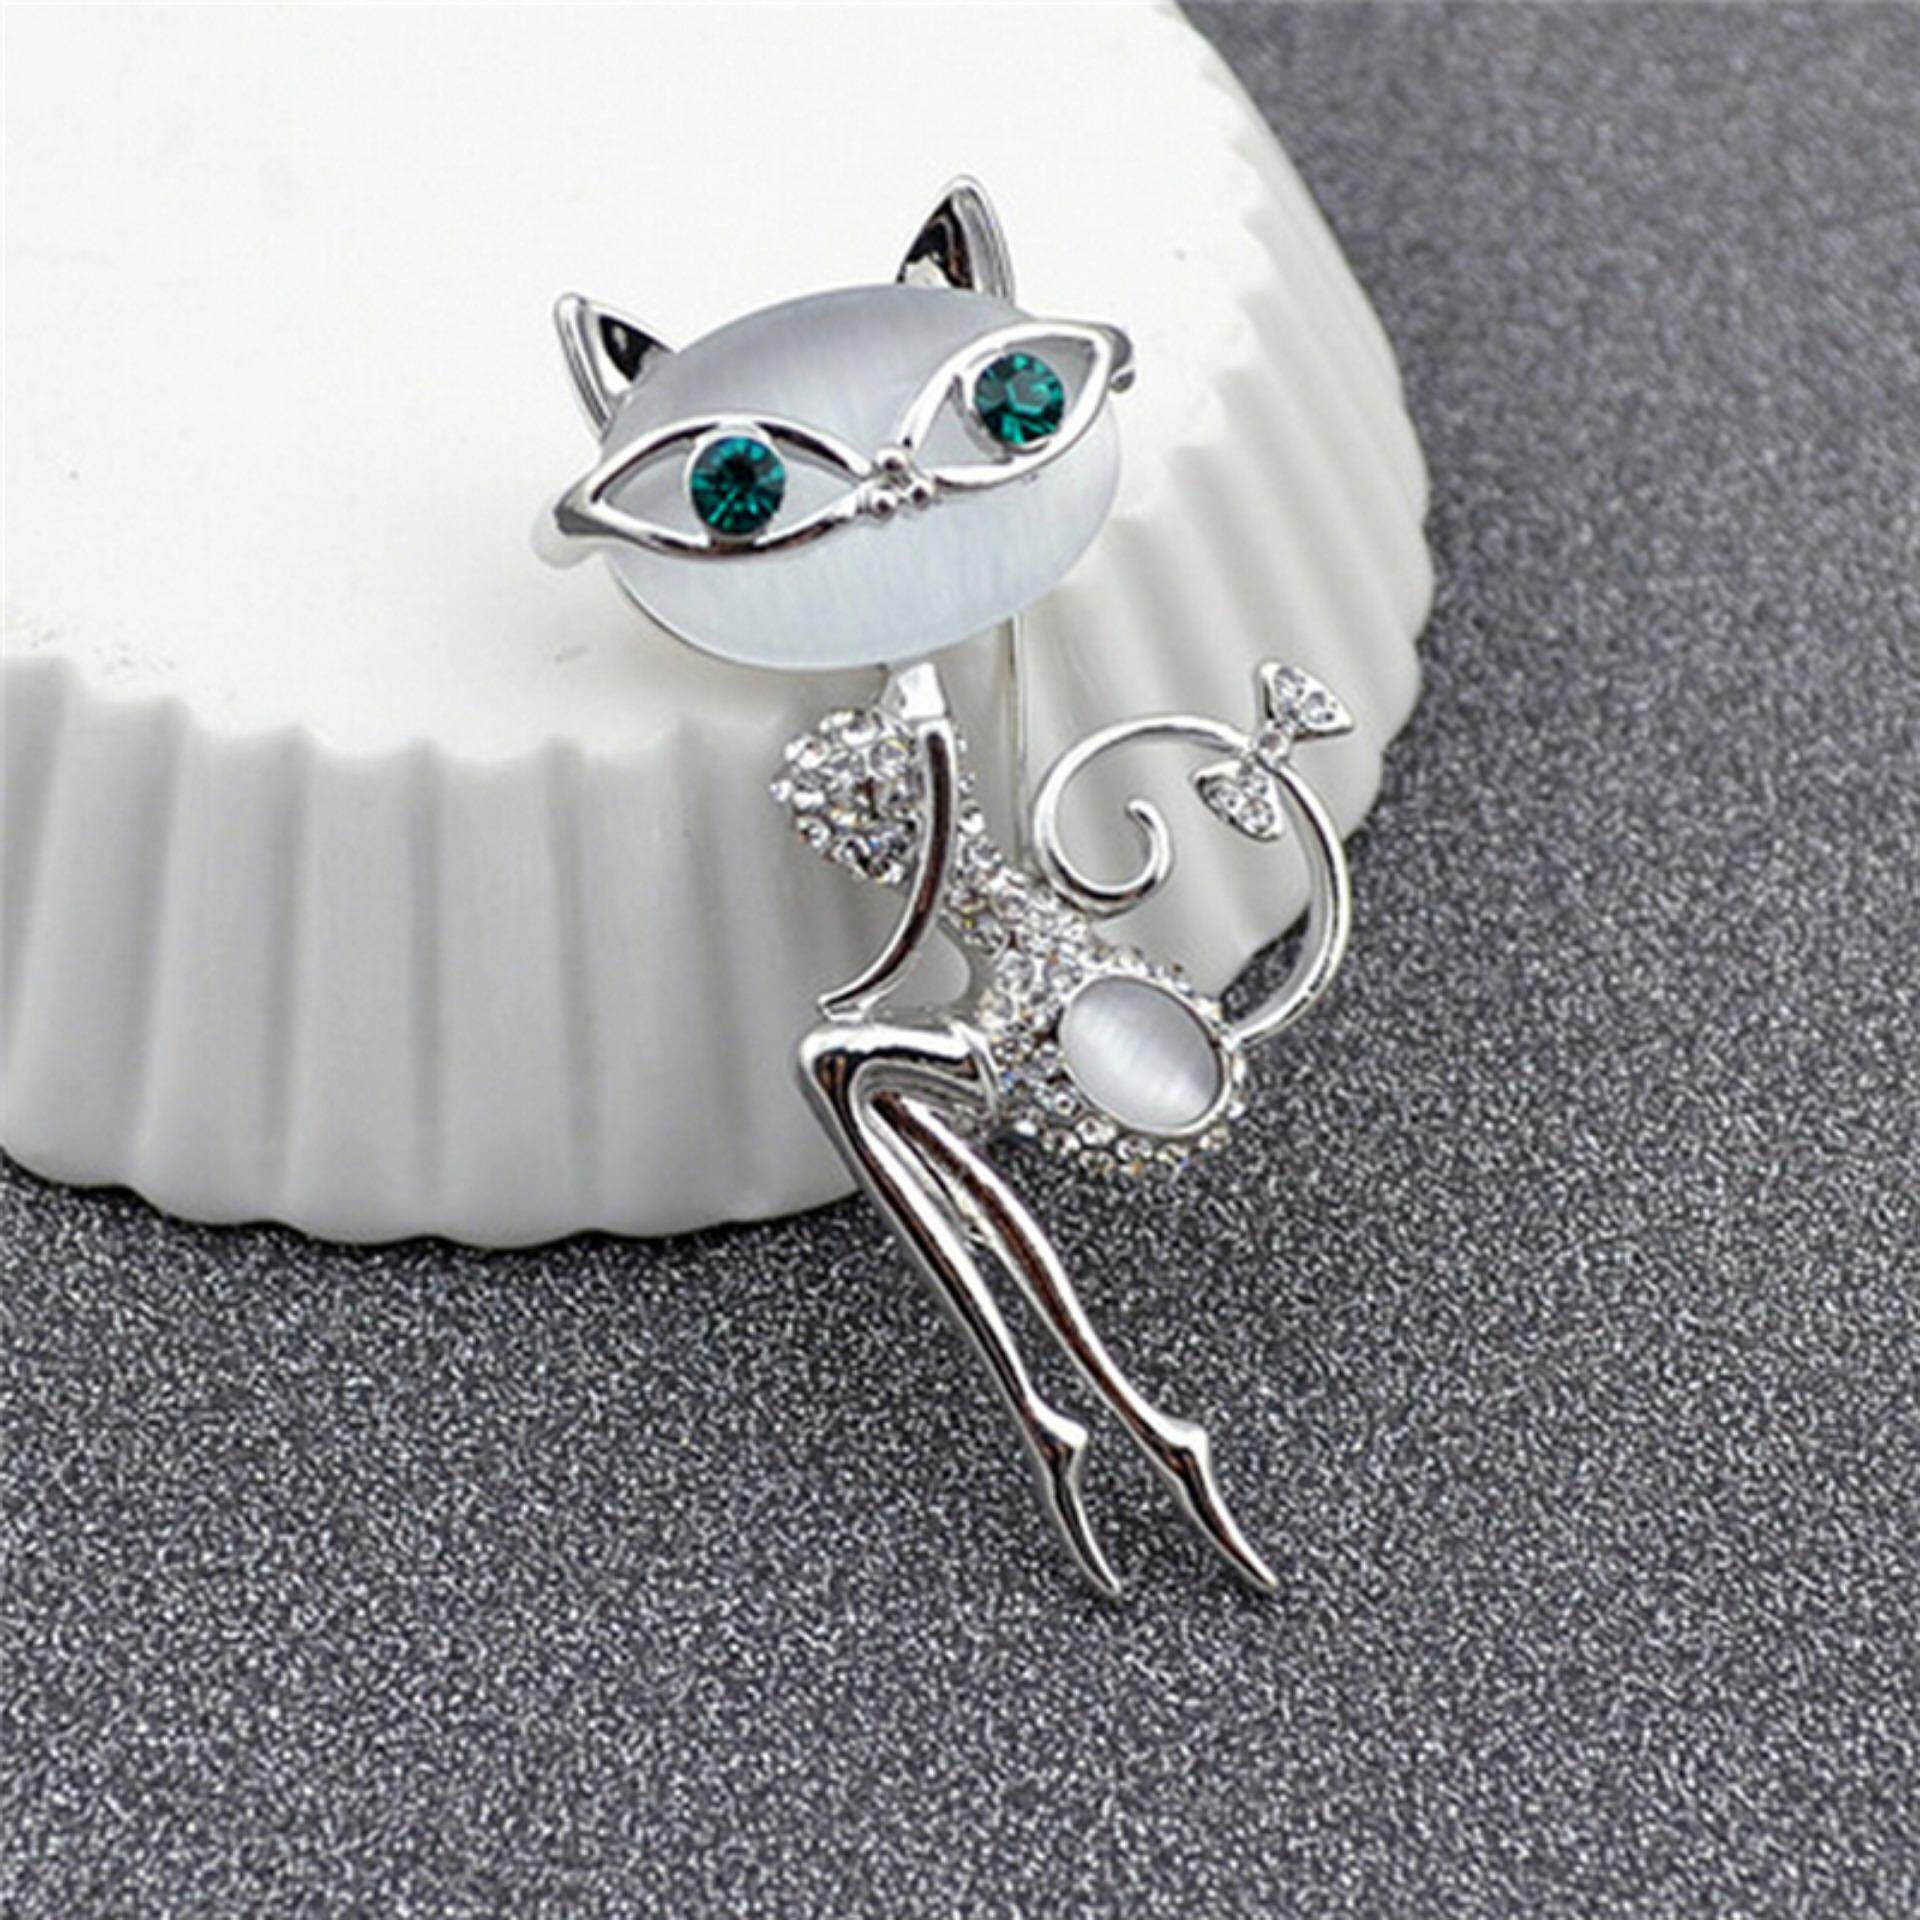 Berlian Tiruan Opal Kristal Kecil Jepit Bros Kucing Hewan Lucu Perhiasan Seksi Fashion